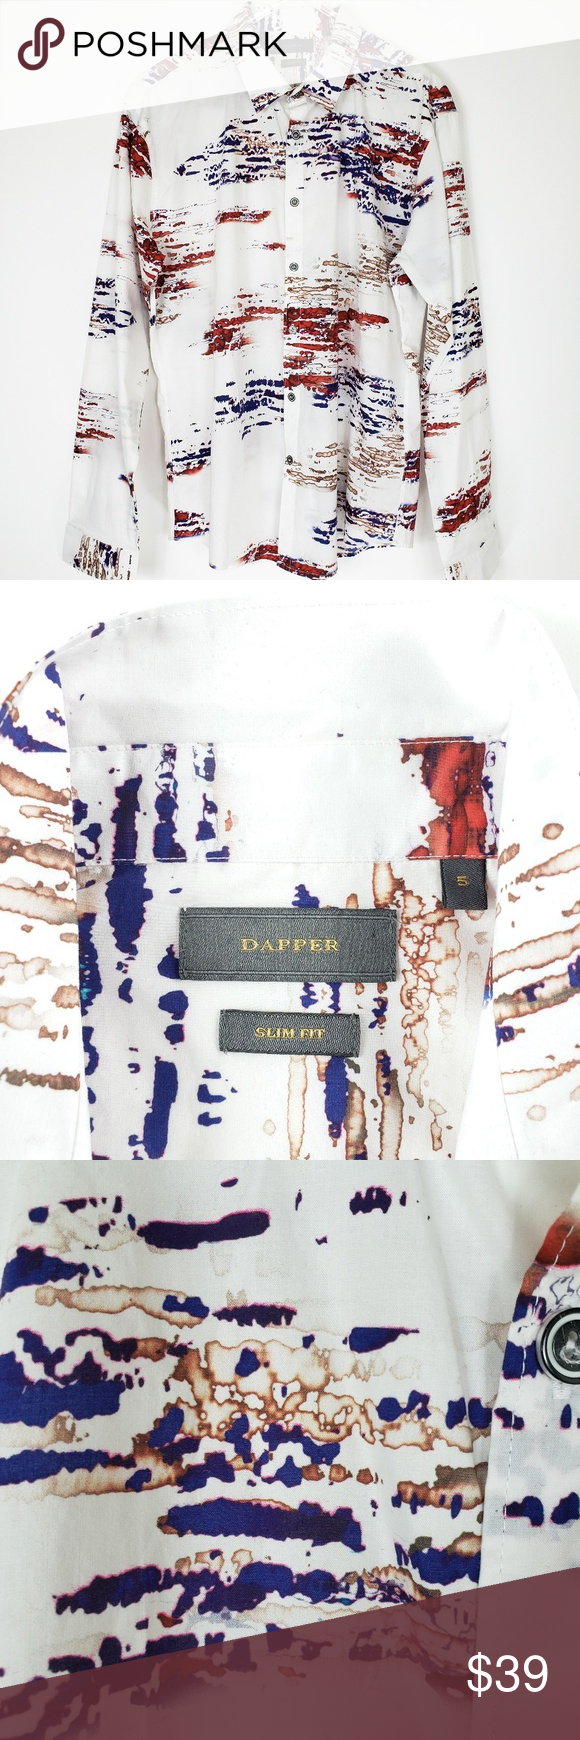 Dapper brand watercolor mens dress shirt 5 L white Dapper